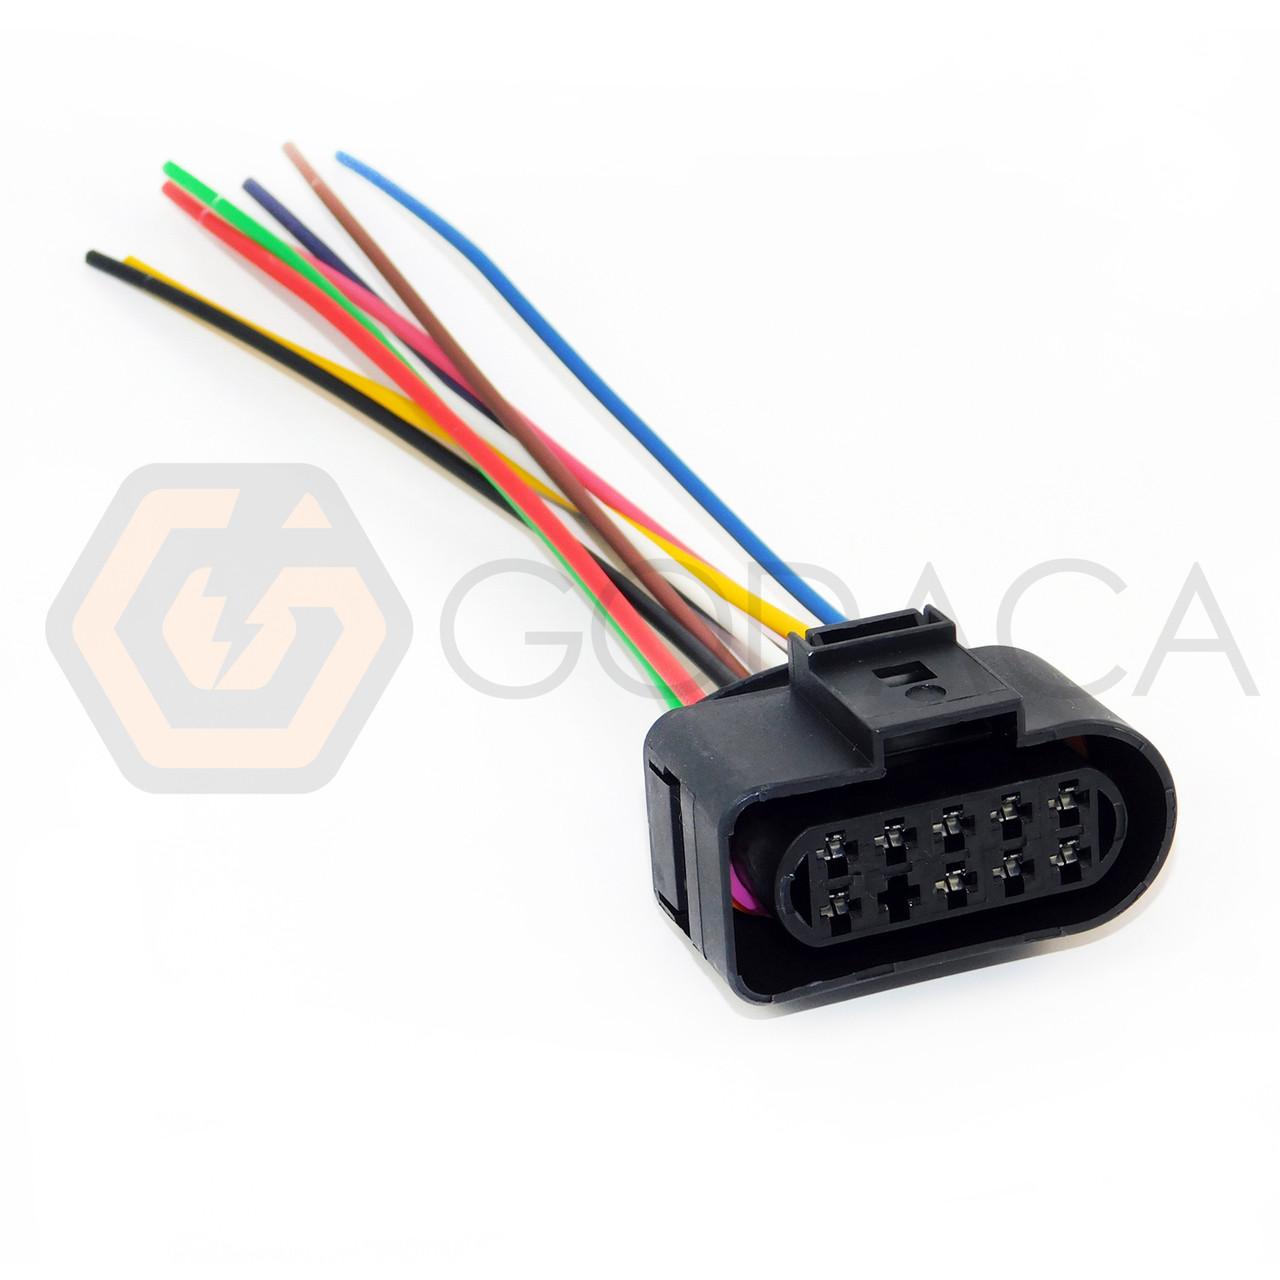 hight resolution of 1 x connector headlight for audi vw seat skoda 1j0973735 1j0 973 735 9 way ford godaca llc